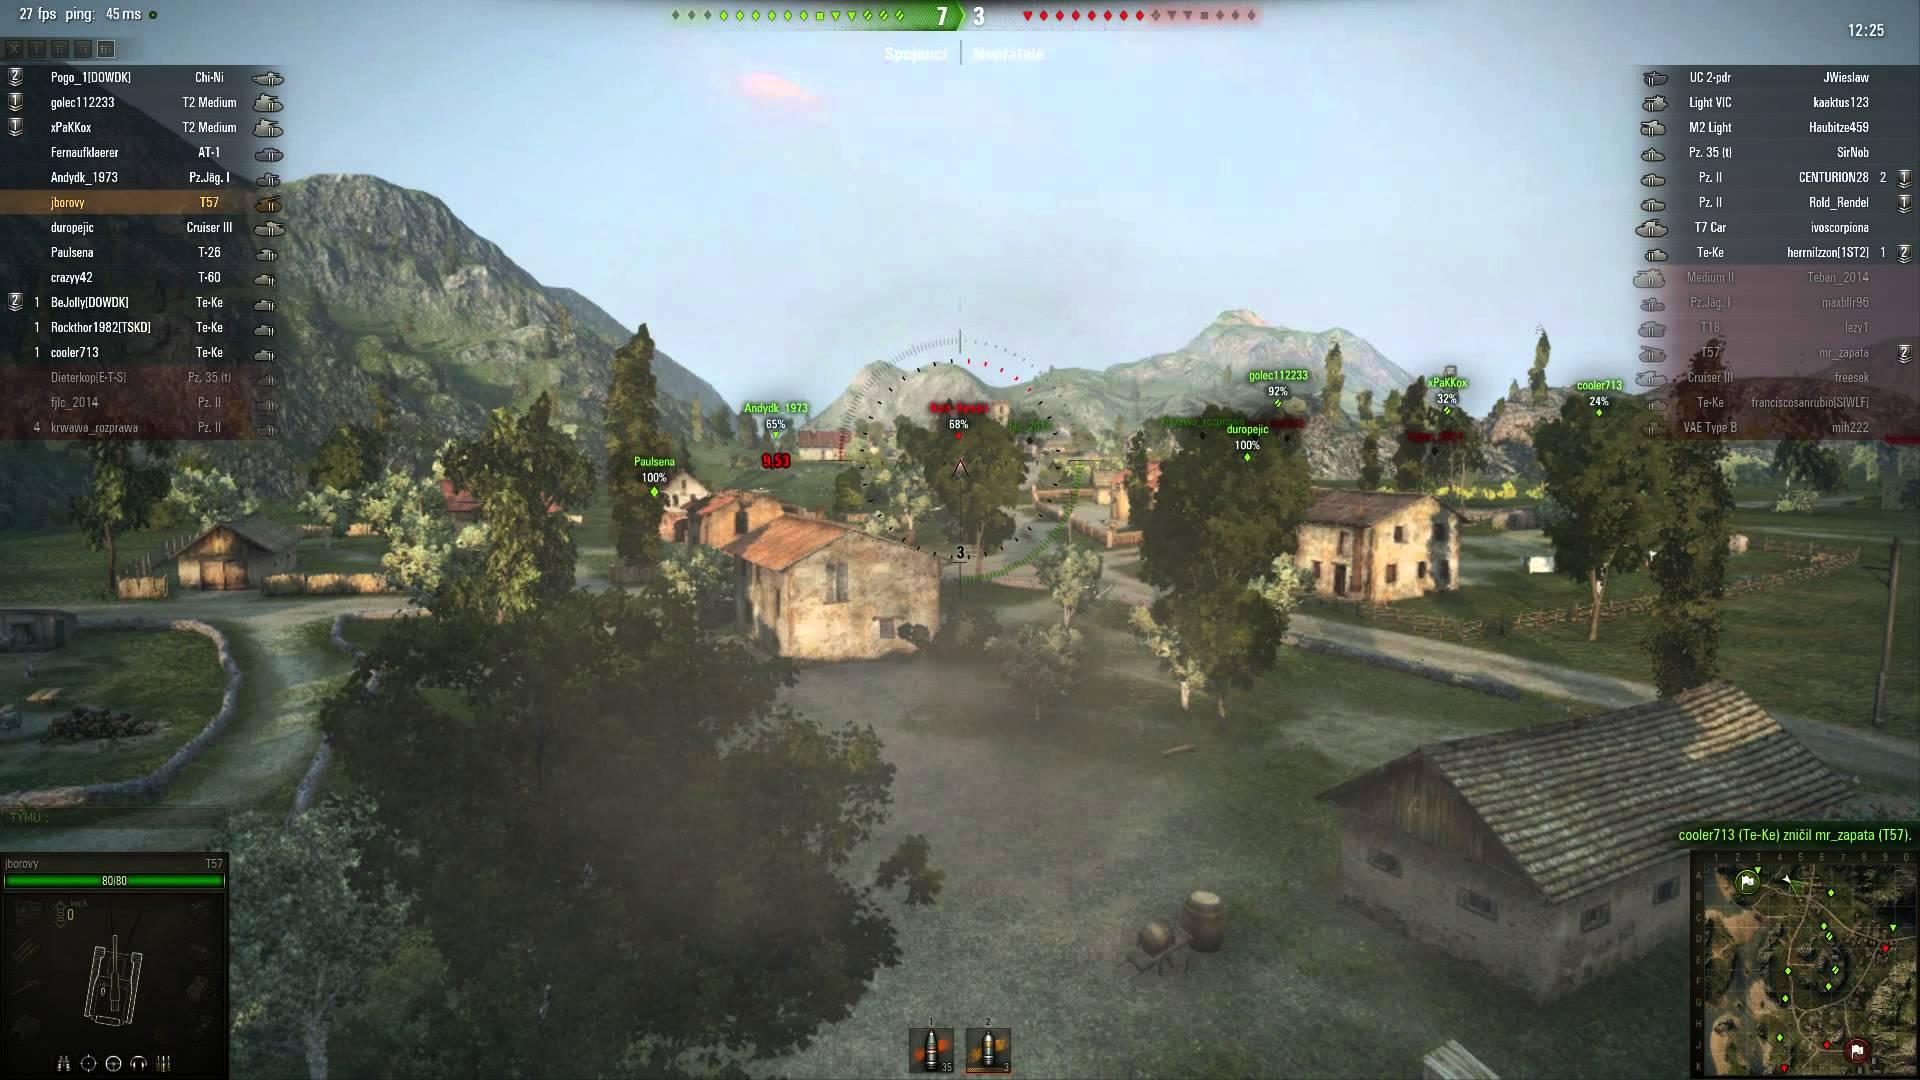 World of Tanks 17